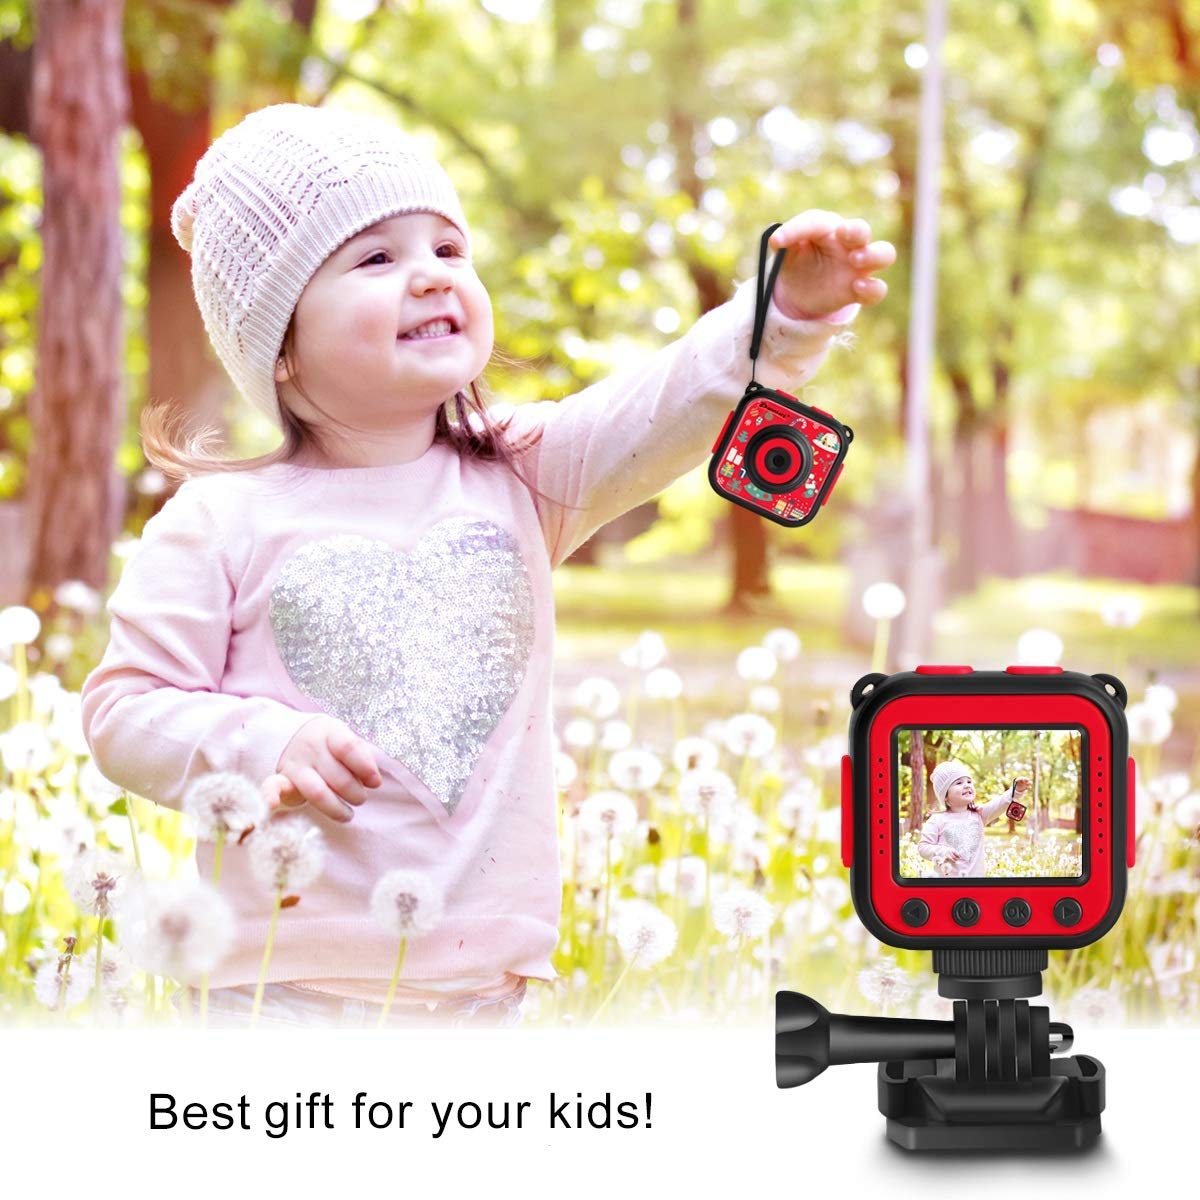 Prograce Kids Camera Underwater Waterproof Camera Camcorder for Boys Girls 4X Digital Zoom 3-Level Volume Adjustment(Red) by Prograce (Image #4)